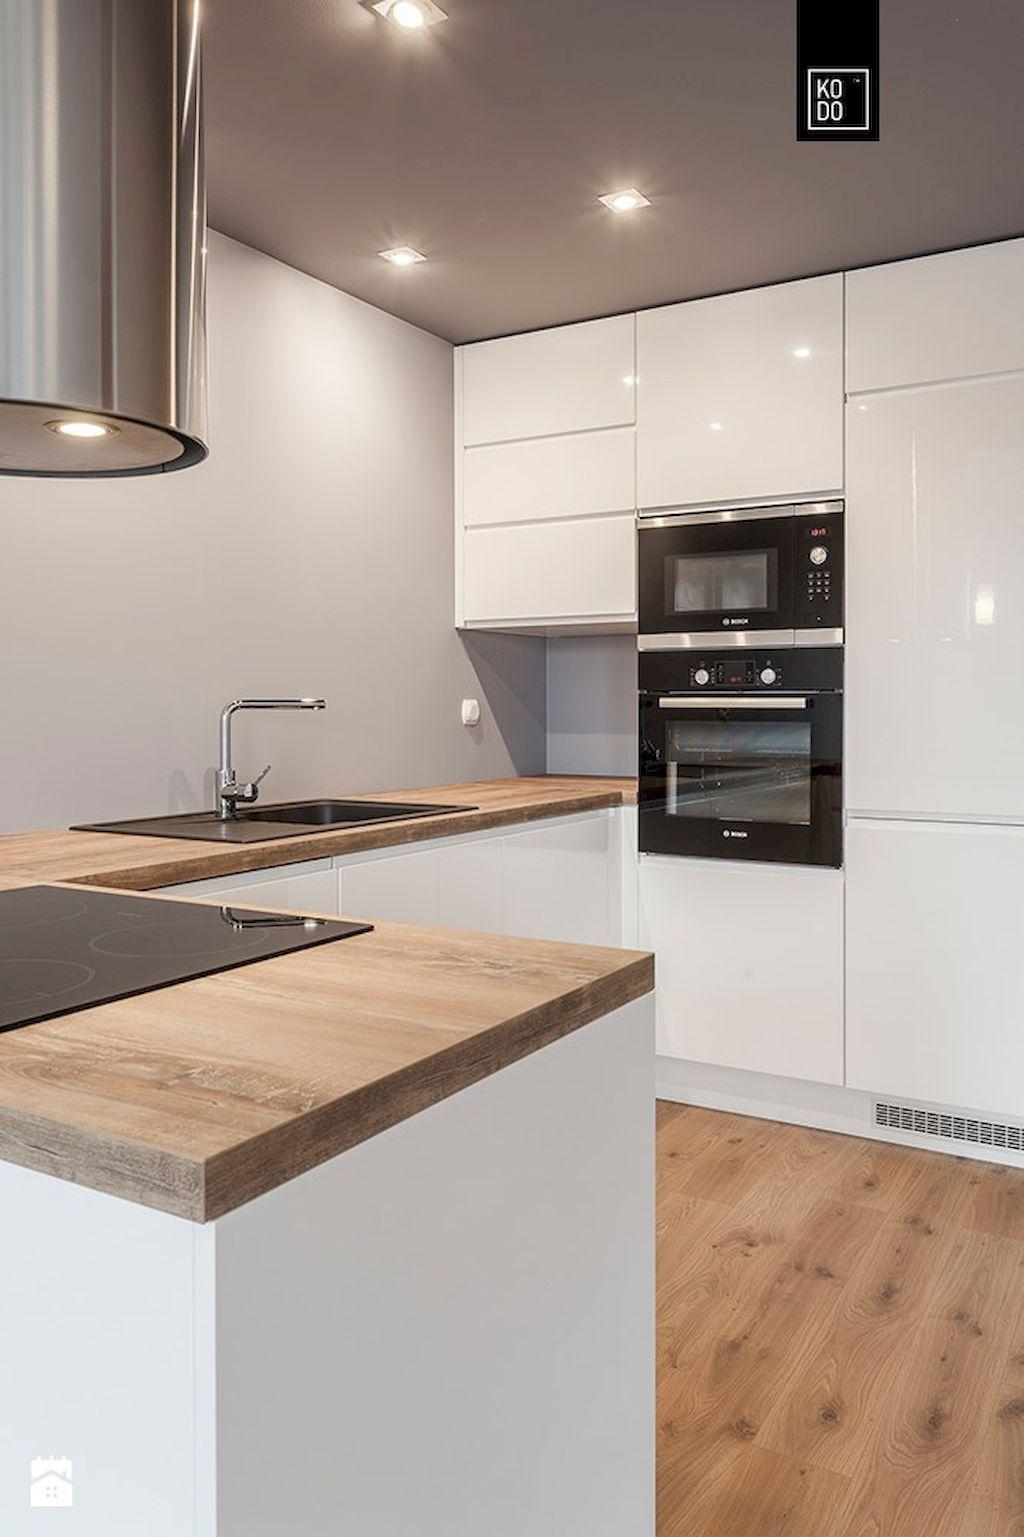 60 farmhouse apartment kitchen decorating ideas in 2020 small apartment kitchen kitchen decor on kitchen makeover ideas id=24222